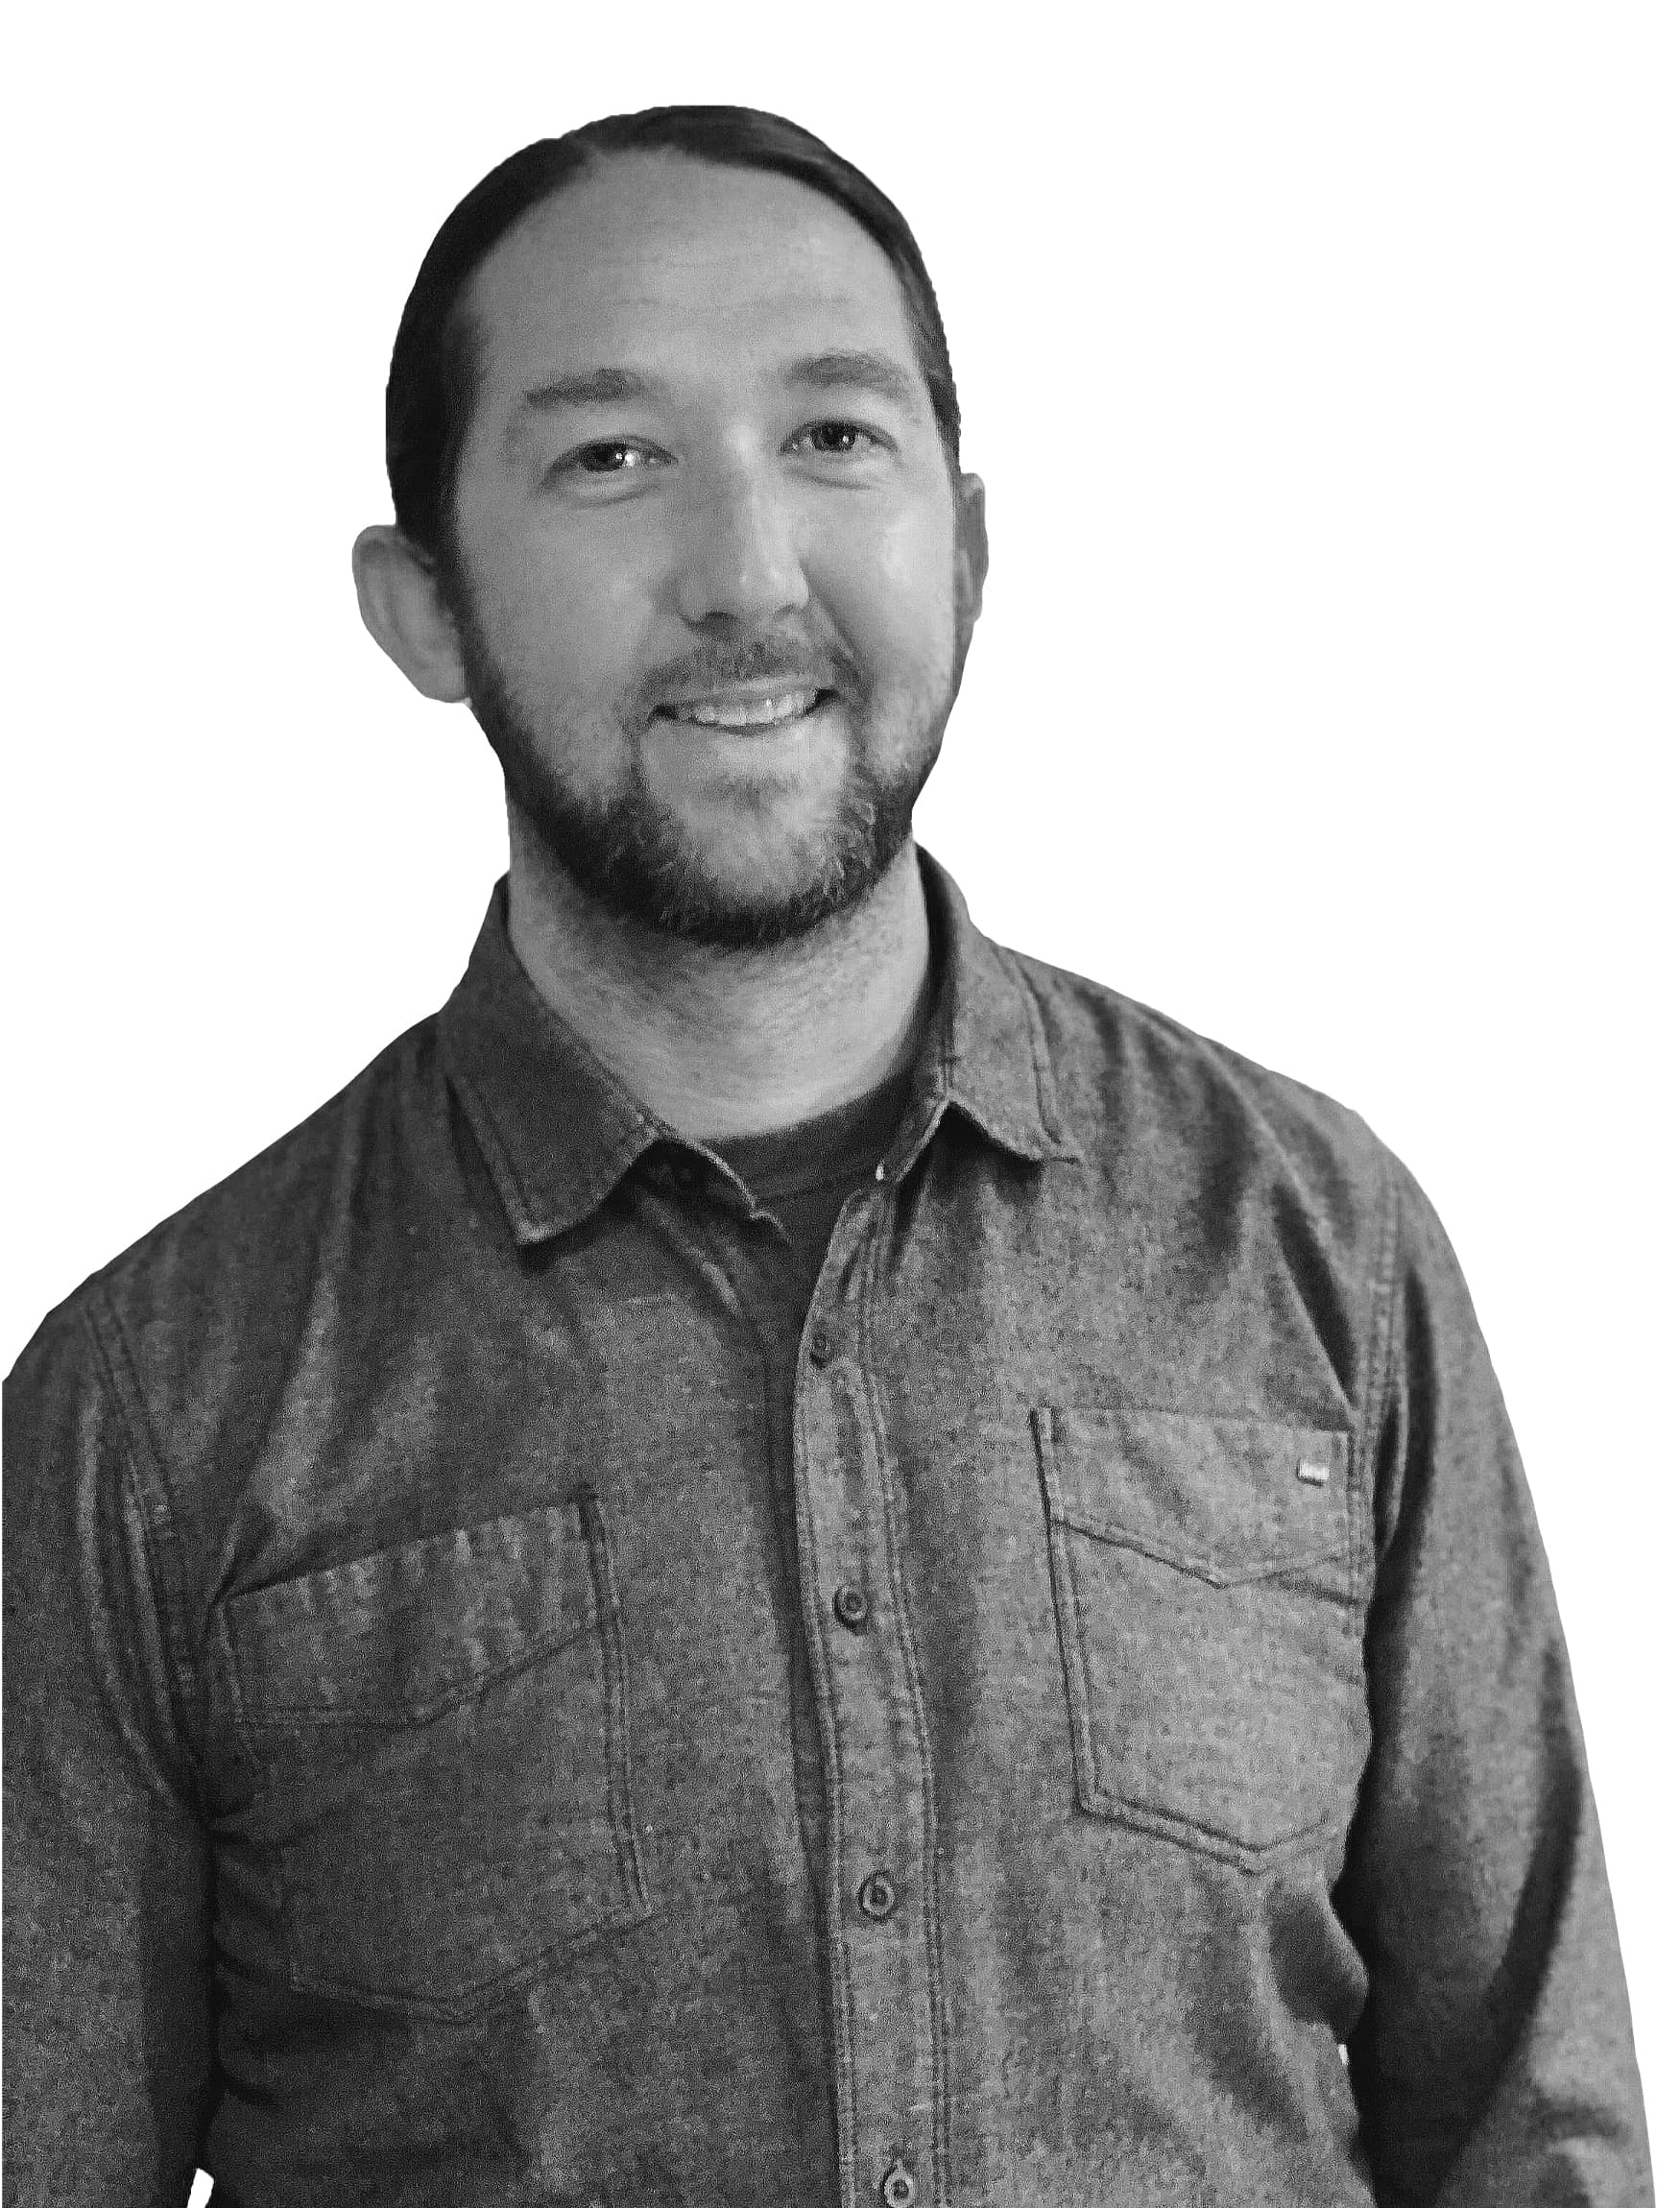 Steve Luoma Associate at RSM Design headshot in black and white